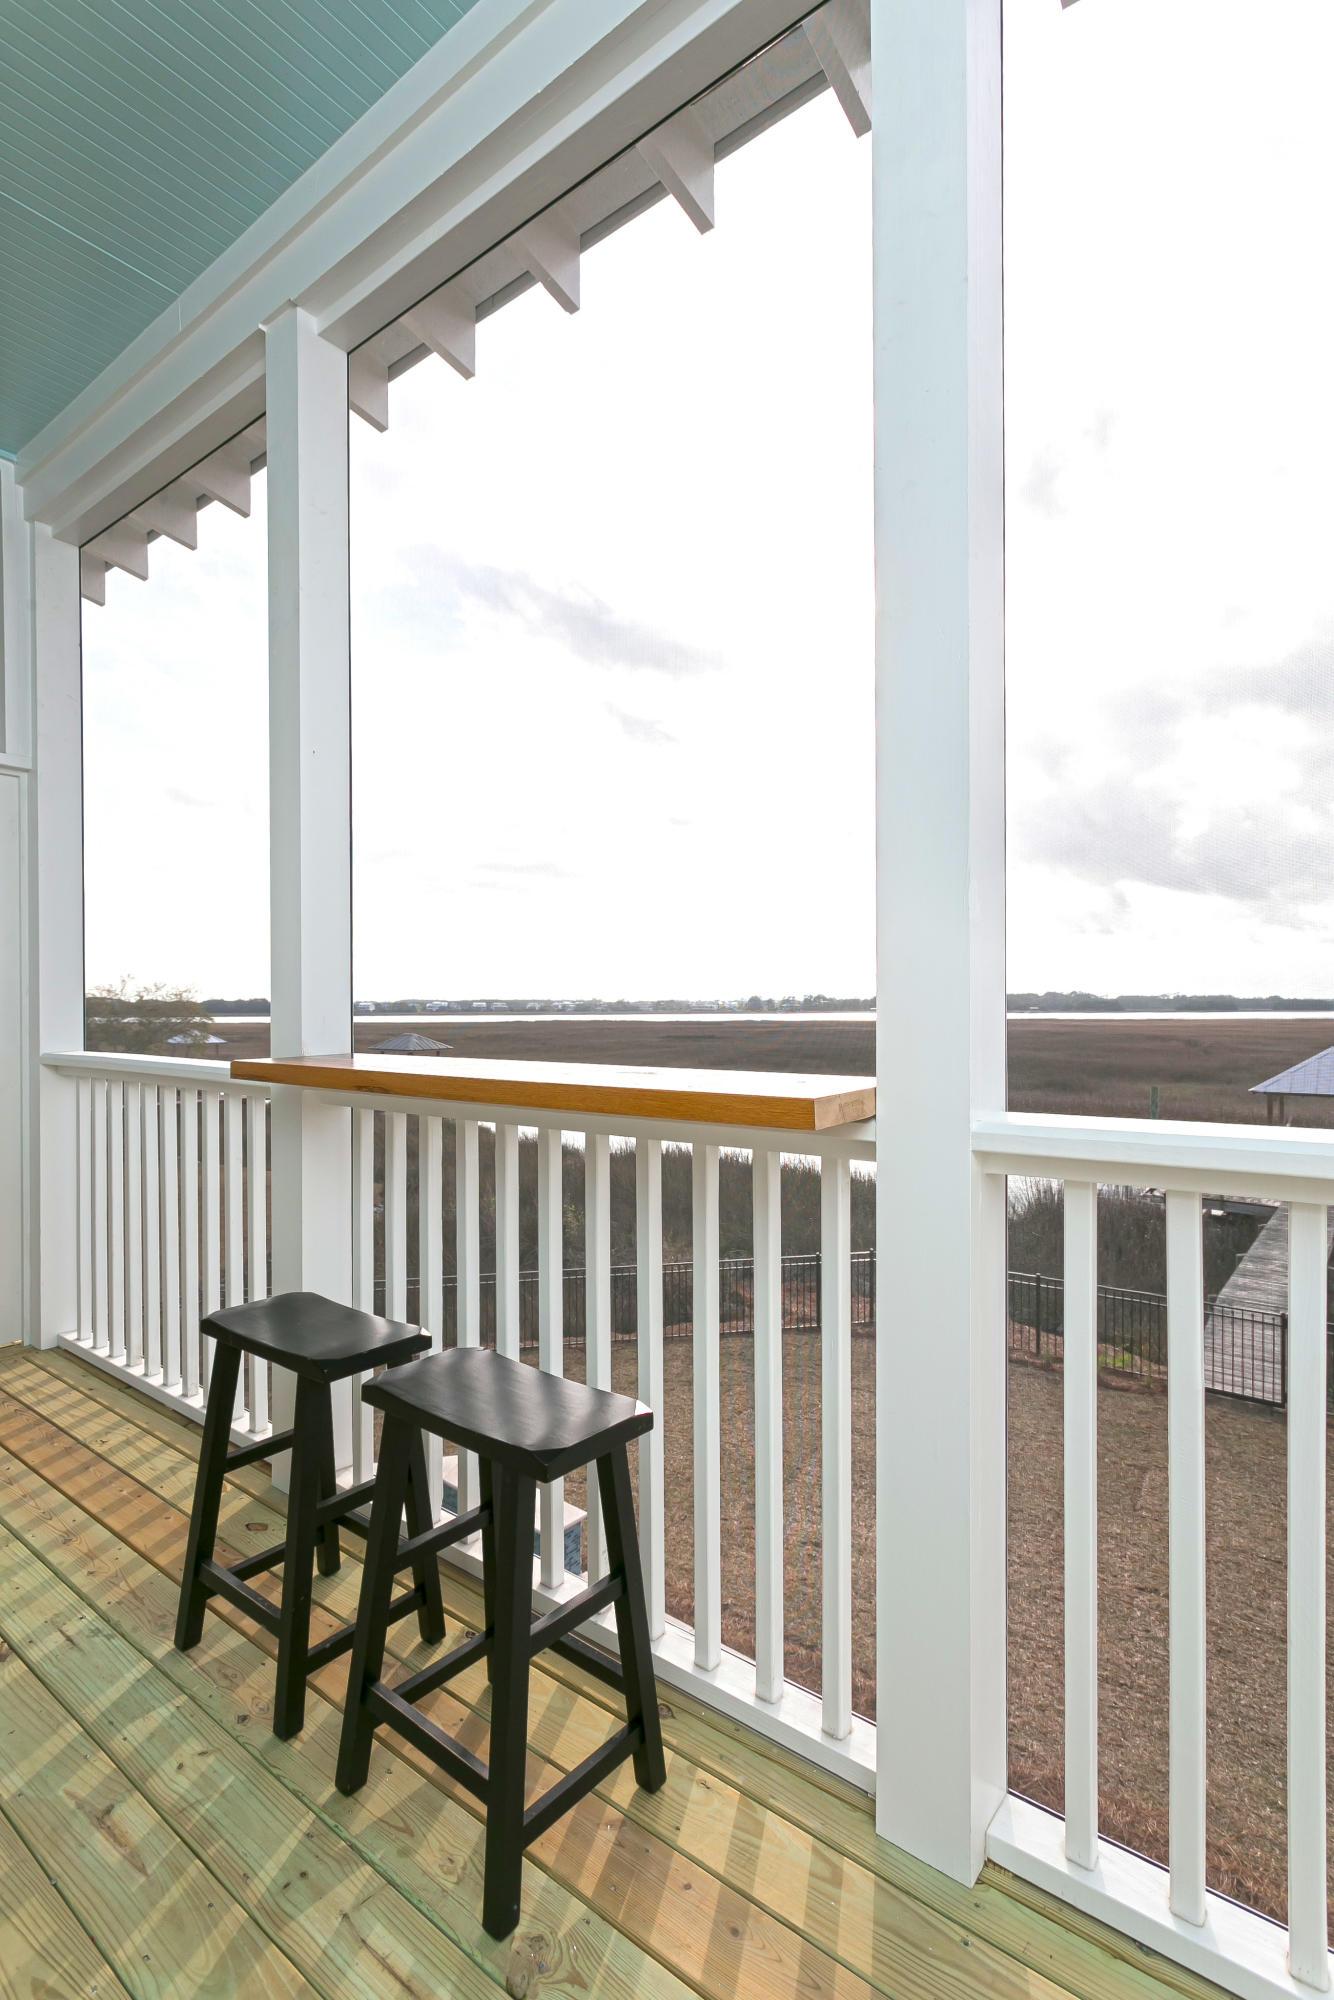 Ravens Point Plantation Homes For Sale - 5576 Frisco, Johns Island, SC - 6